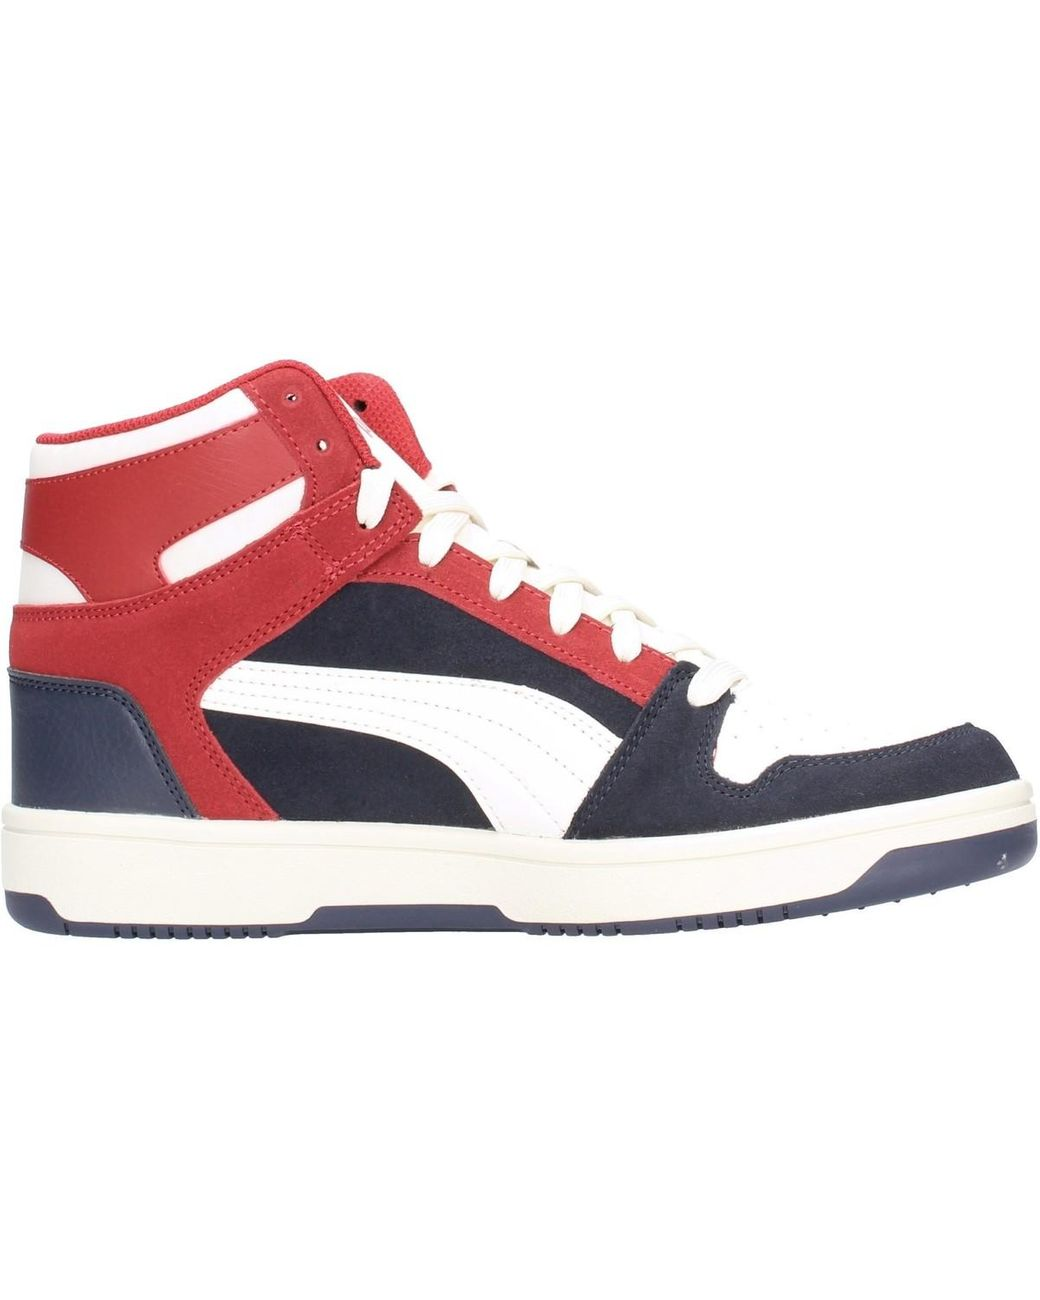 Rebound layup bco/blu/ros 370219-04 Chaussures PUMA pour homme en ...